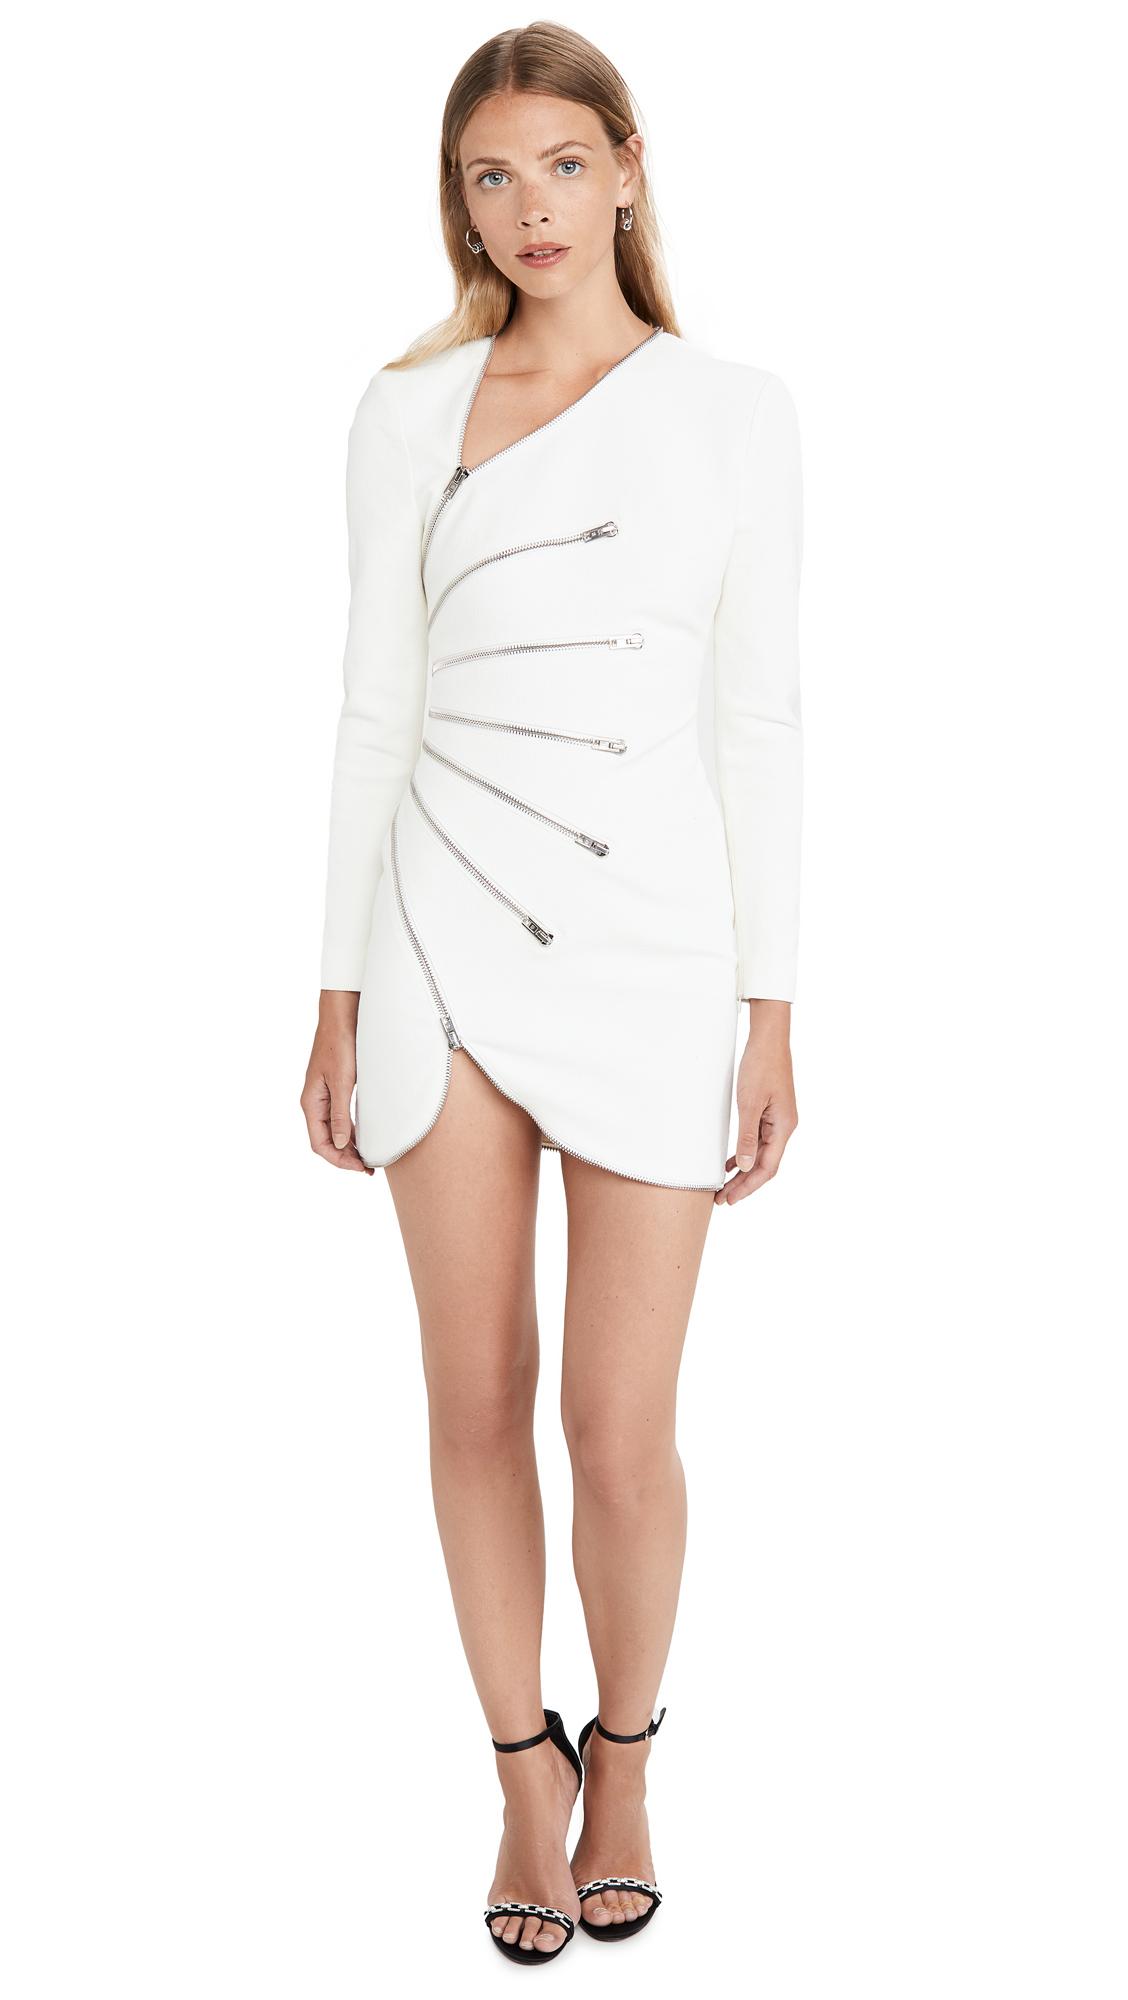 Buy Alexander Wang Long Sleeve Sunburst Zip Dress online beautiful Alexander Wang Clothing, Dresses